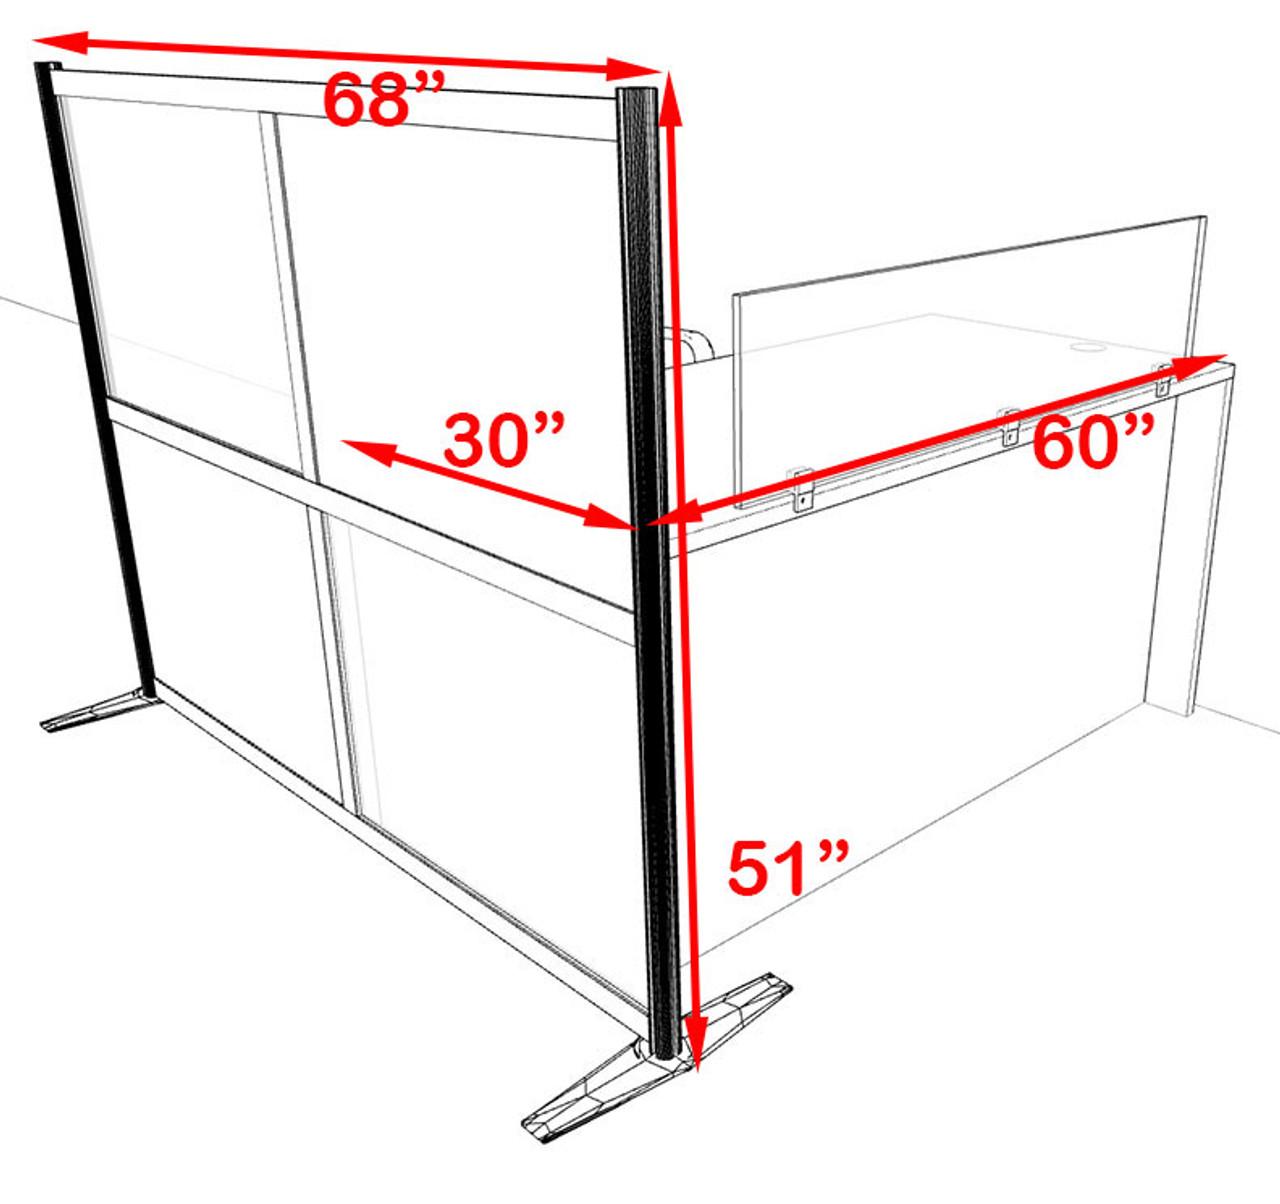 One Person Workstation w/Acrylic Aluminum Privacy Panel, #OT-SUL-HPB38